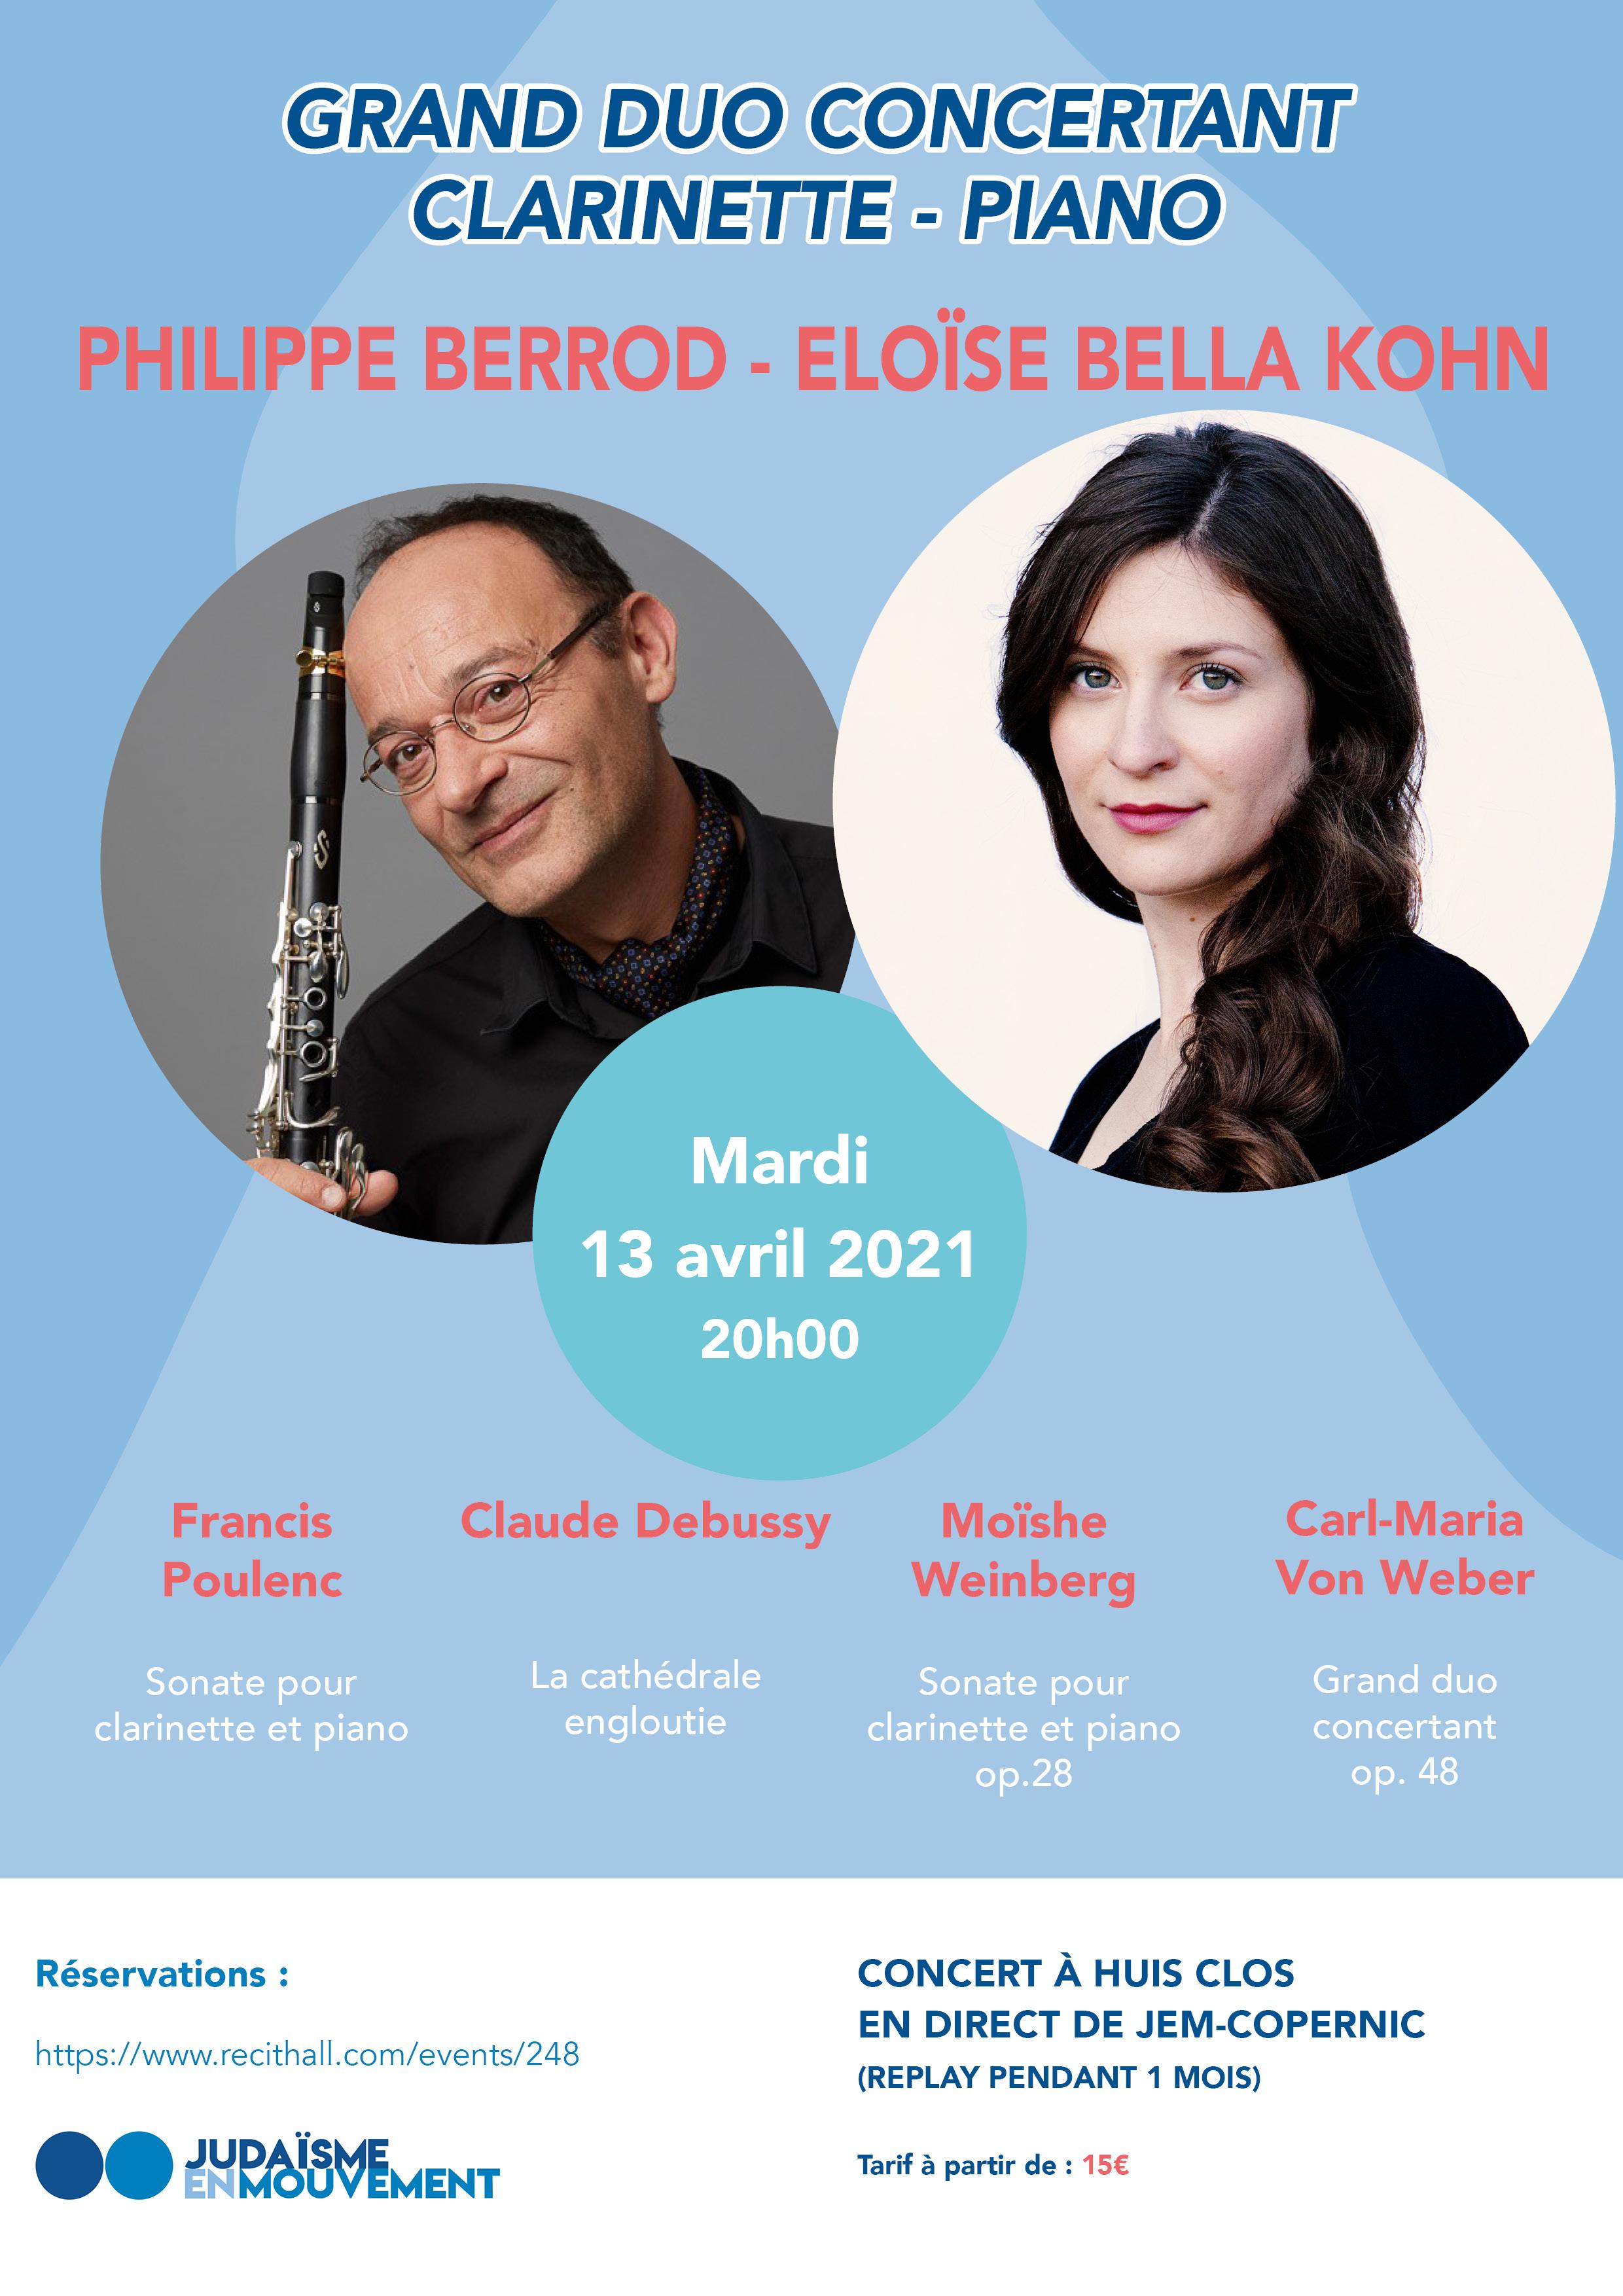 Grand duo concertant clarinette-piano, avec Philippe Berrod et Eloïse Bella Kohn